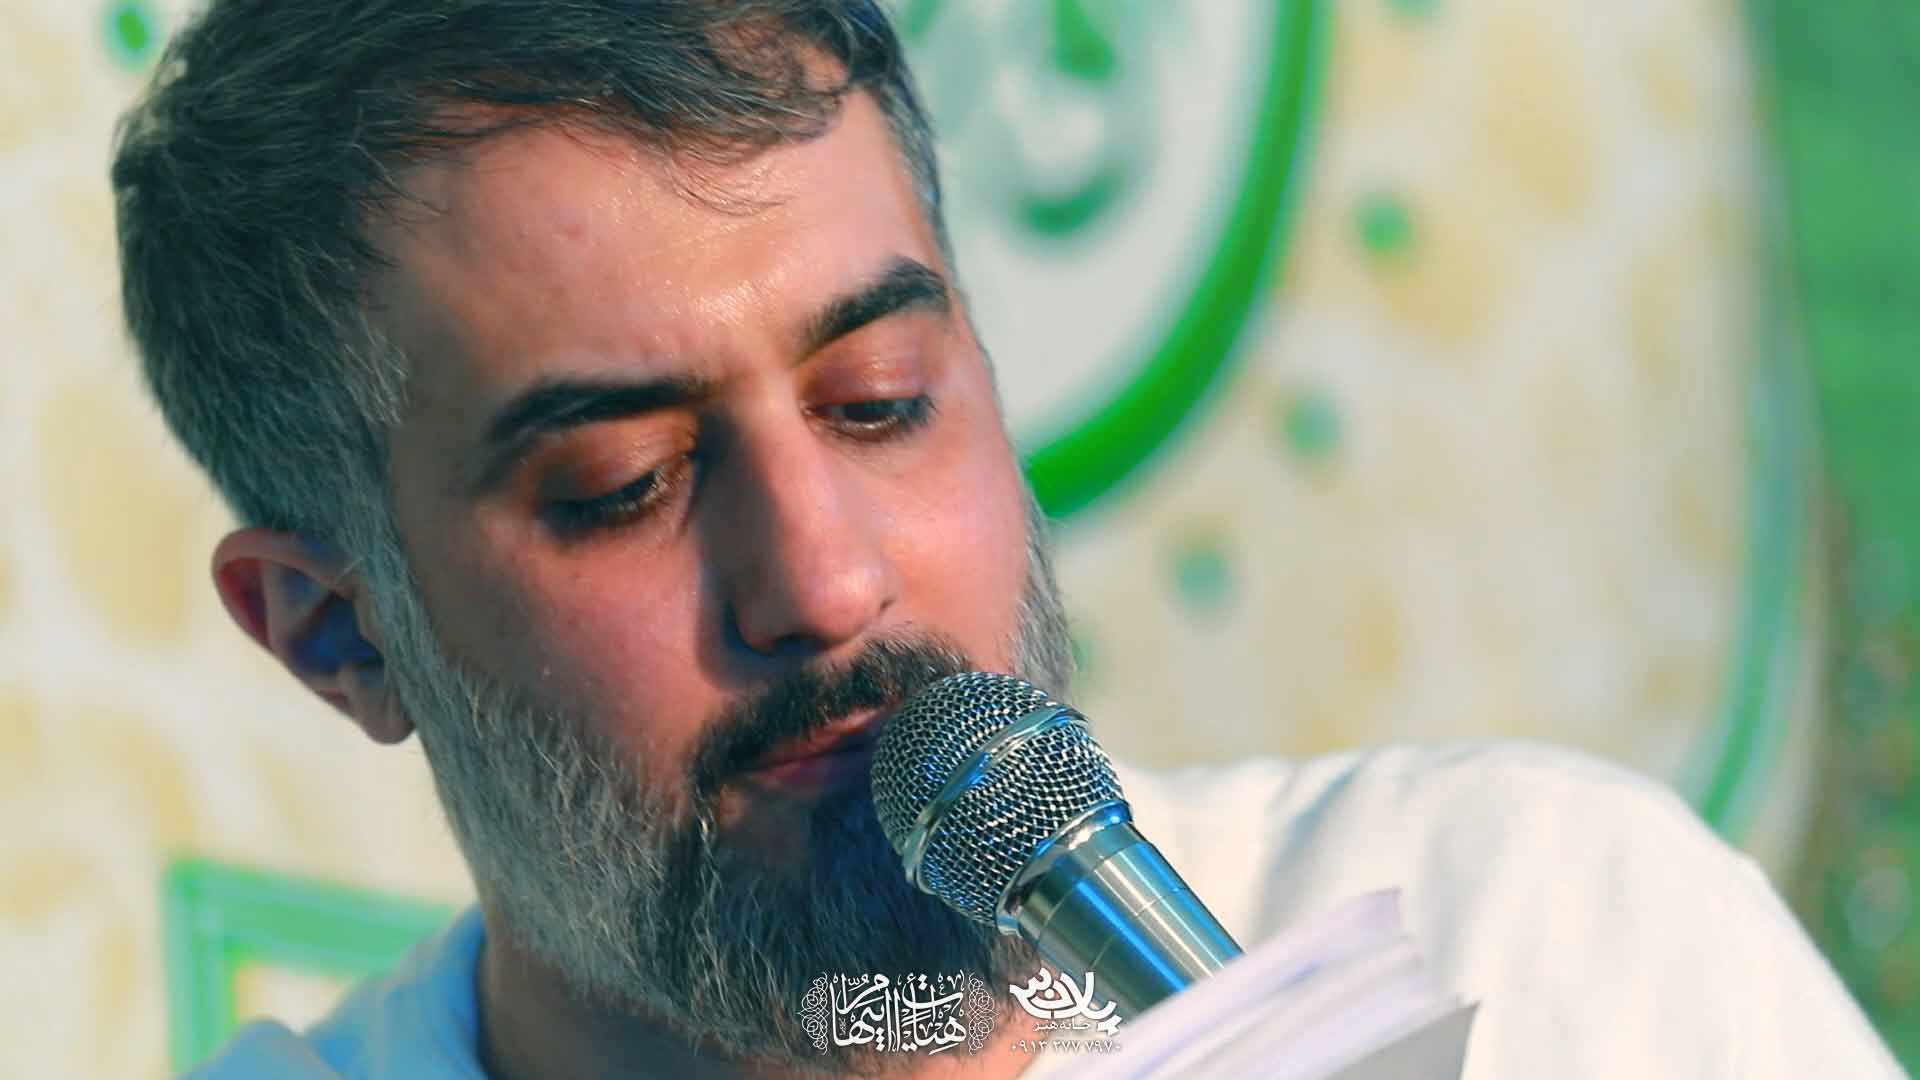 این حسن کیست محمدحسین پویانفر